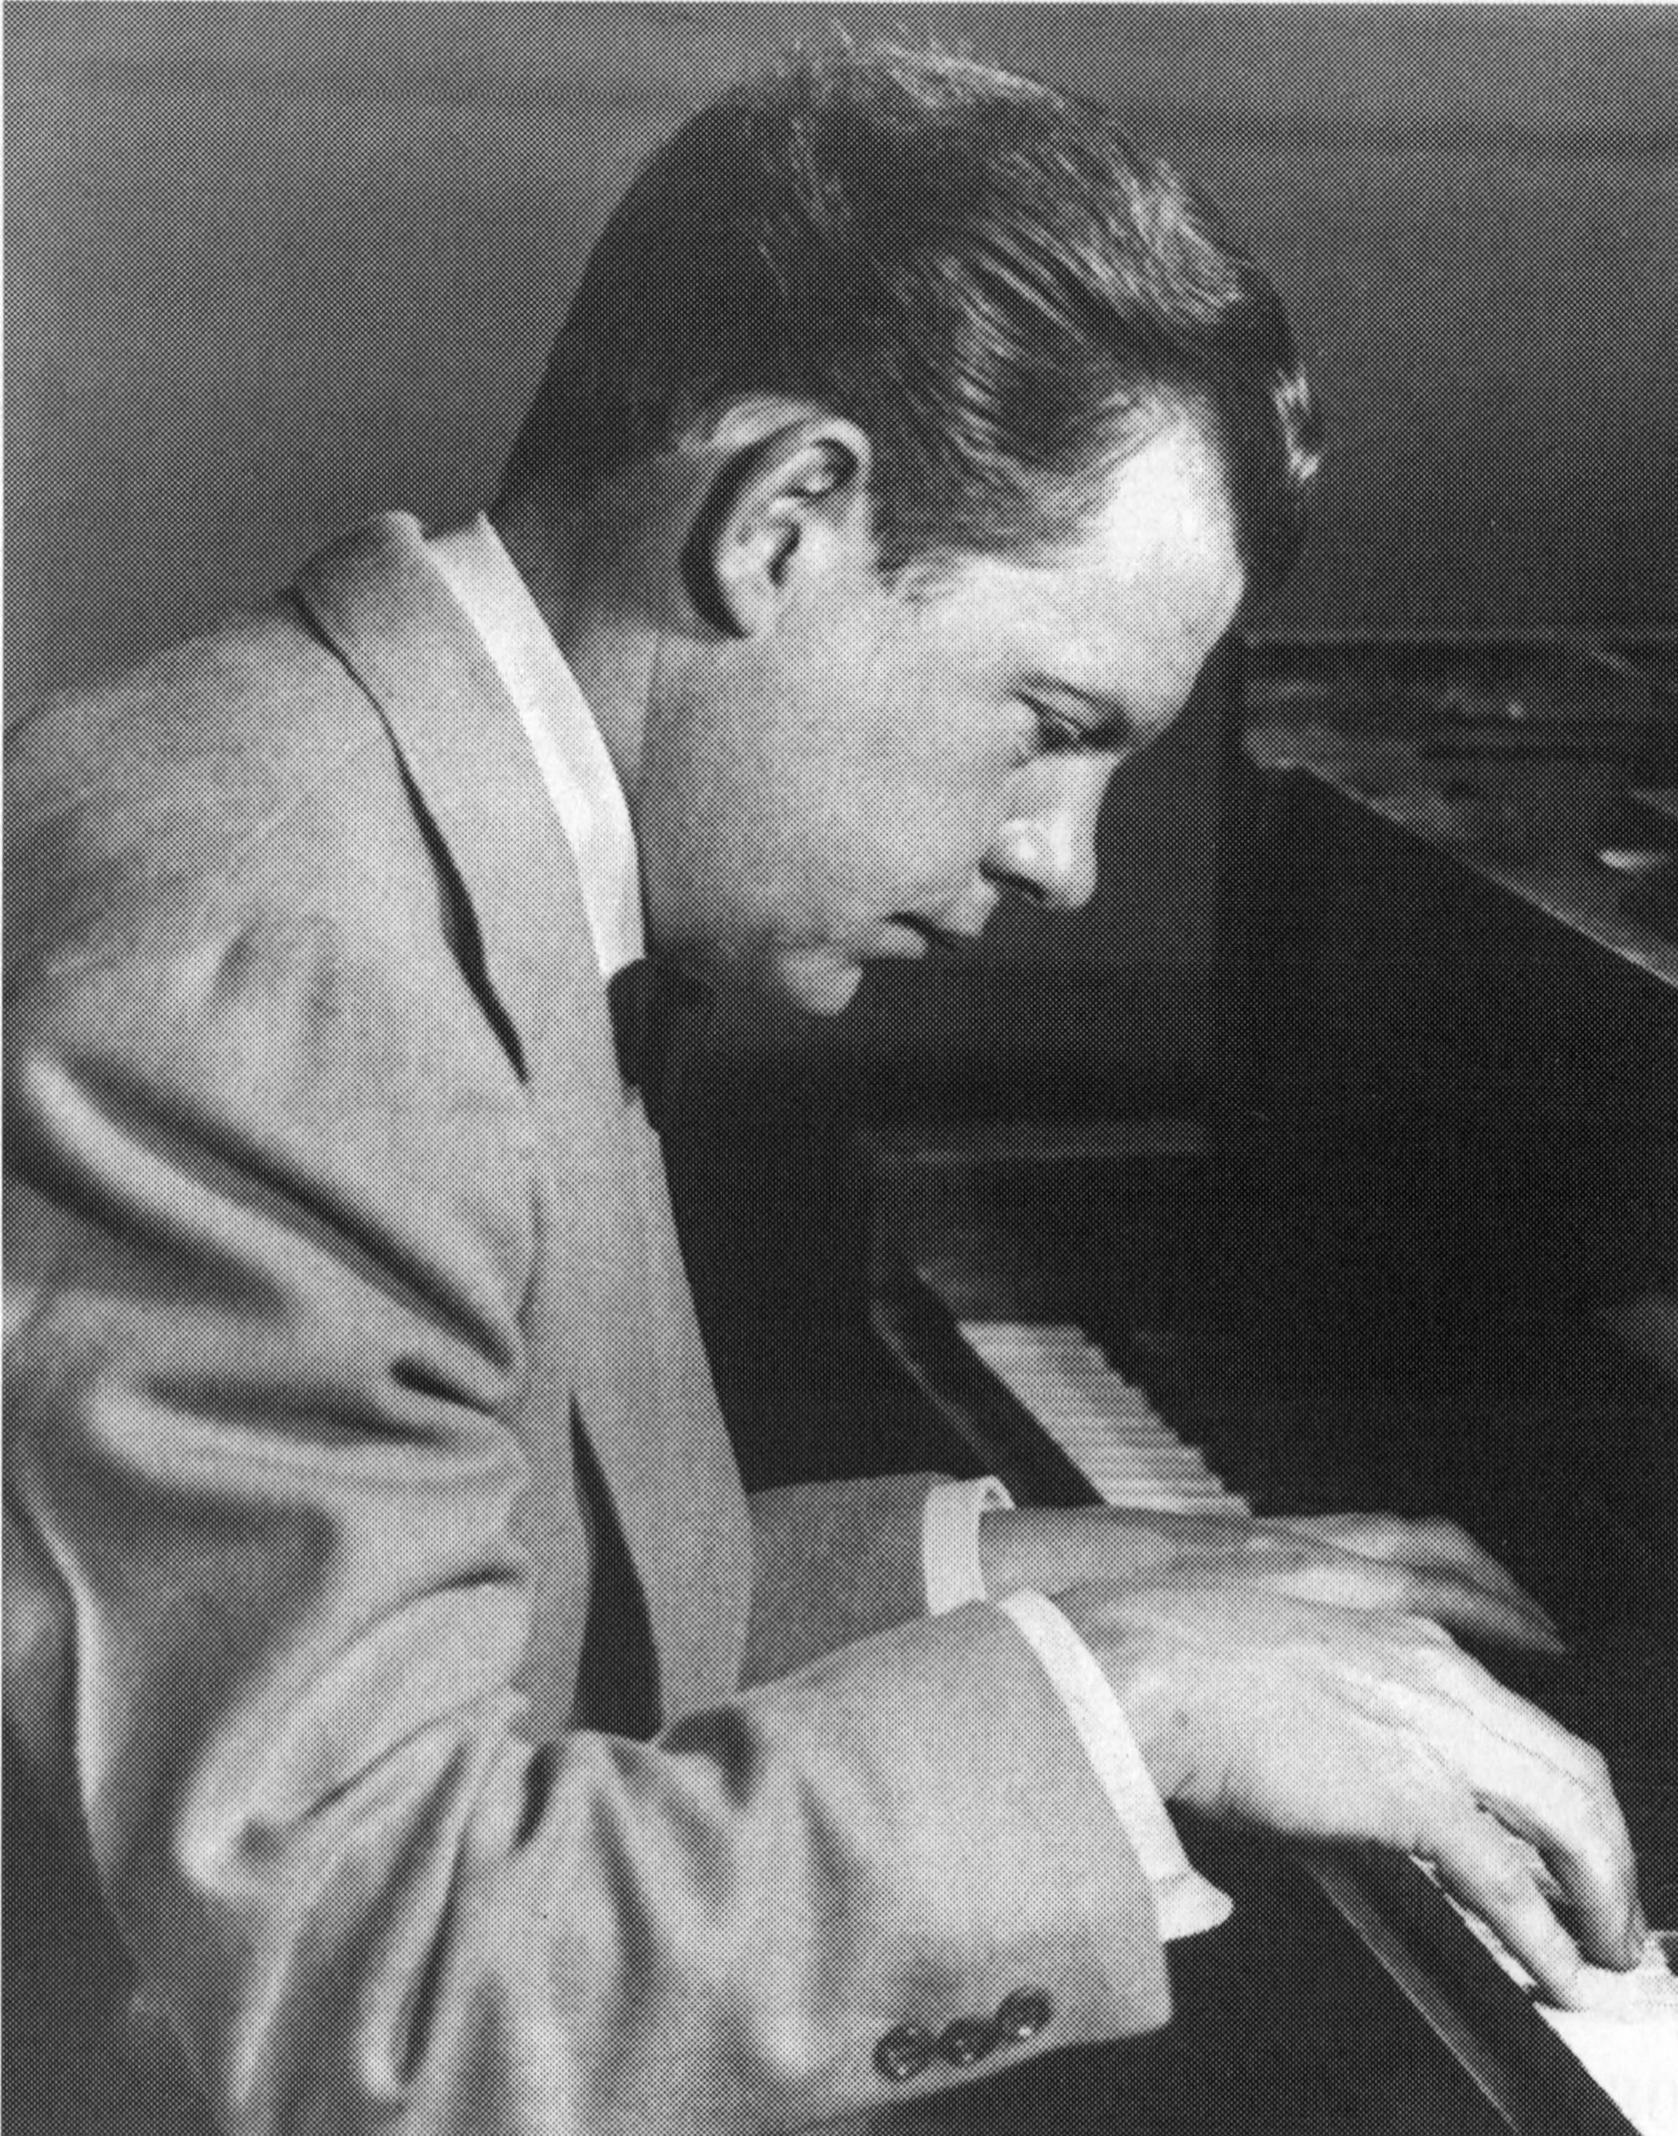 Claude Thornhill - August 1940.